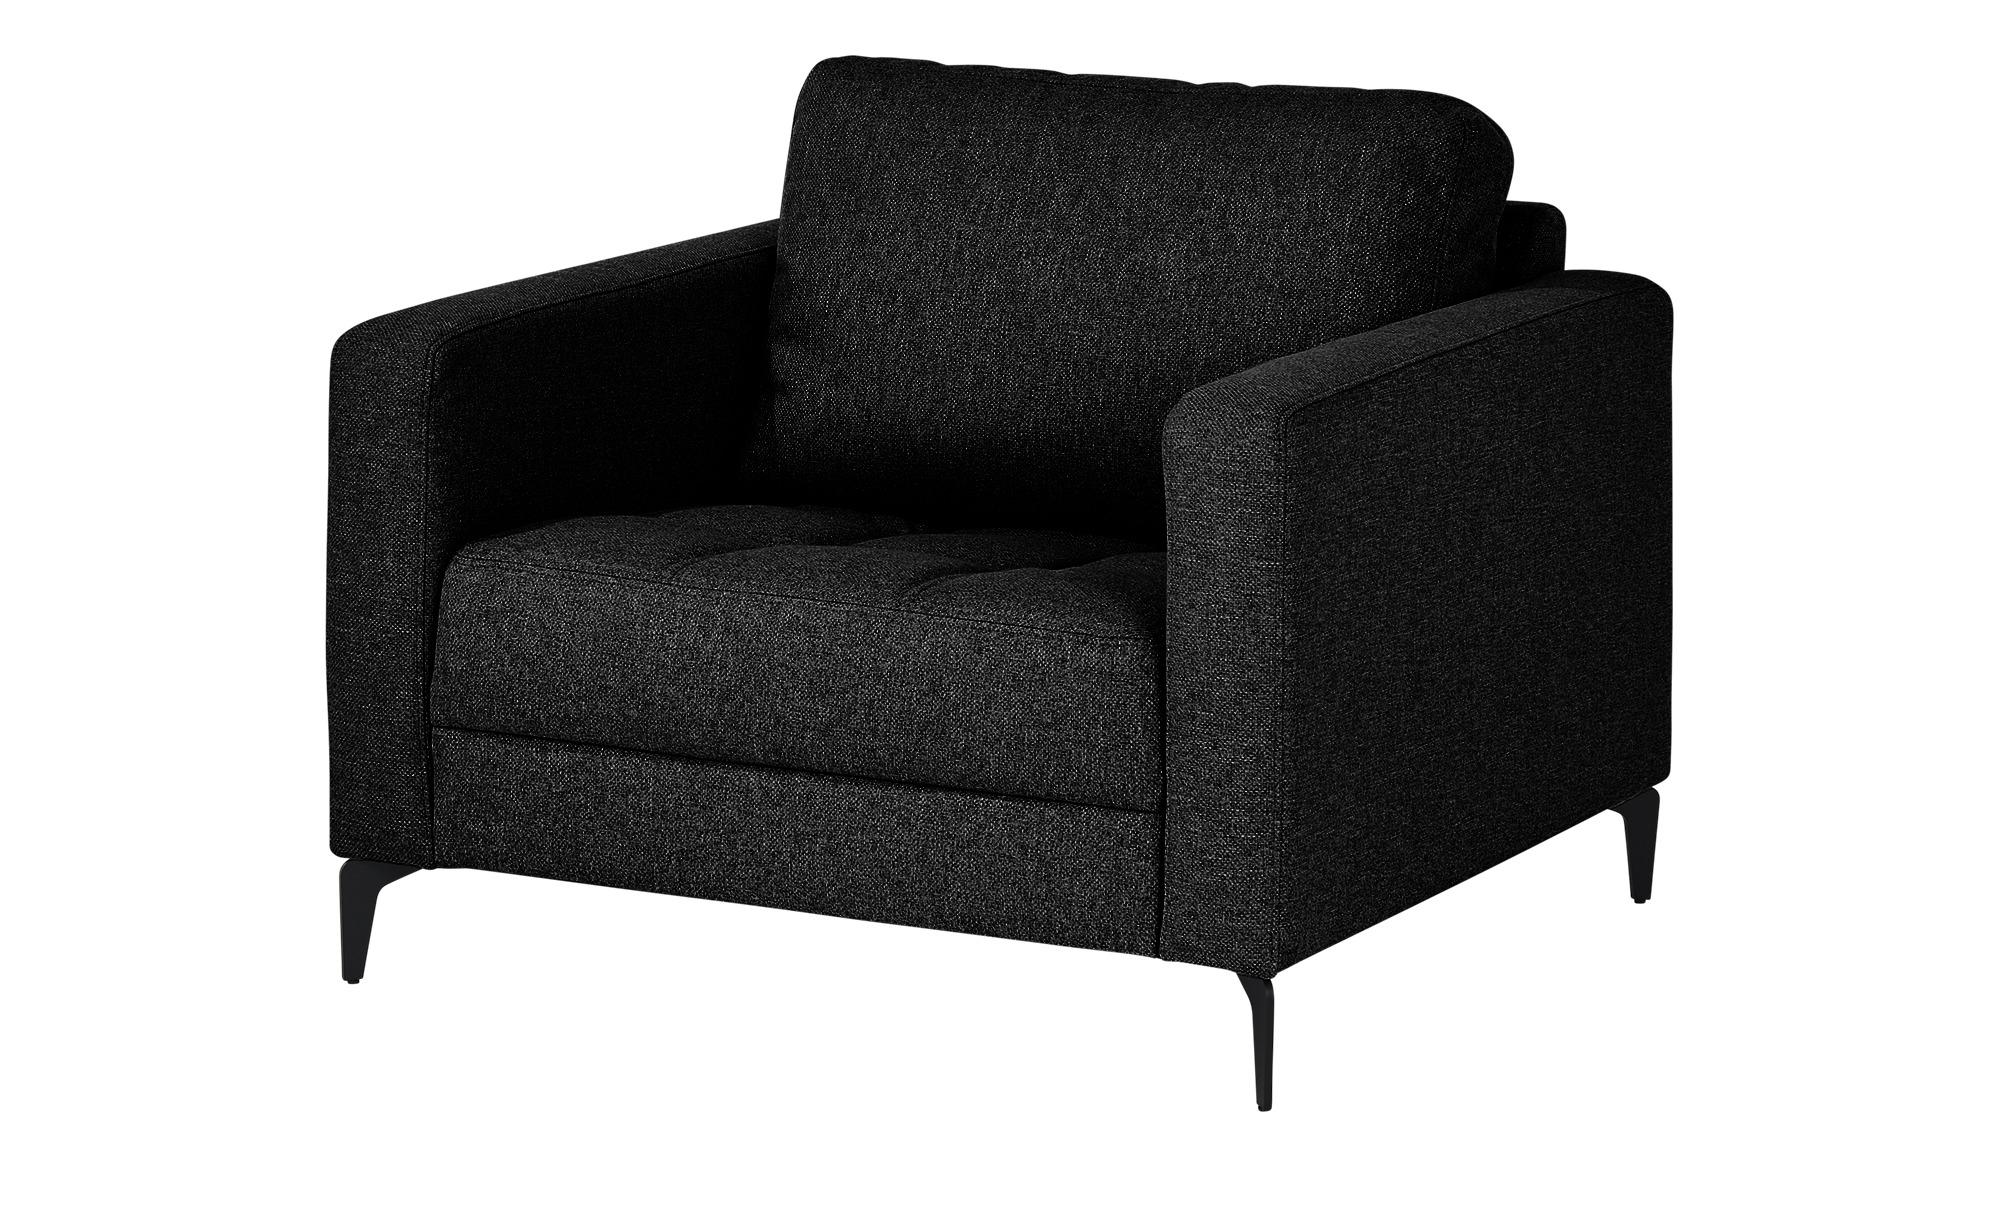 smart Sessel  Gesa ¦ schwarz ¦ Maße (cm): B: 102 H: 83 T: 91 Polstermöbel > Sessel > Polstersessel - Höffner